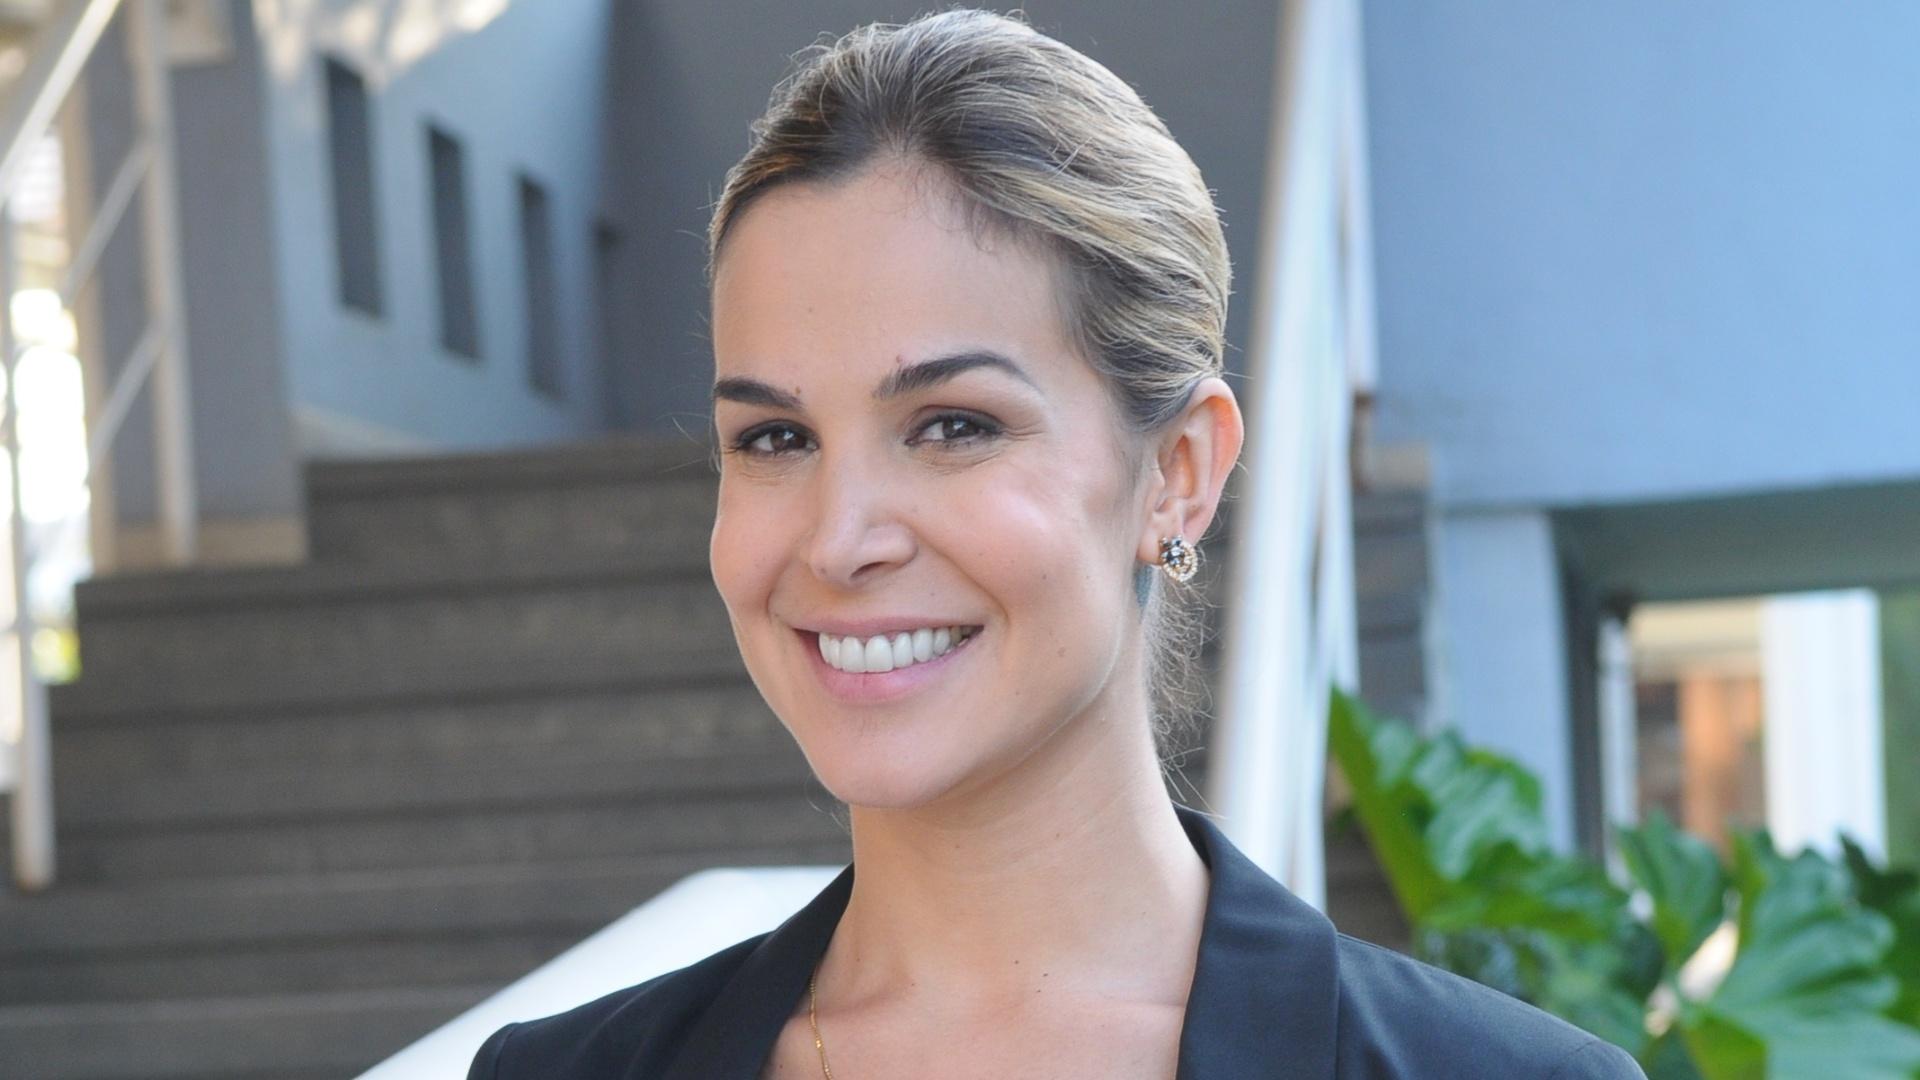 Robertha Portella também entrou no elenco de